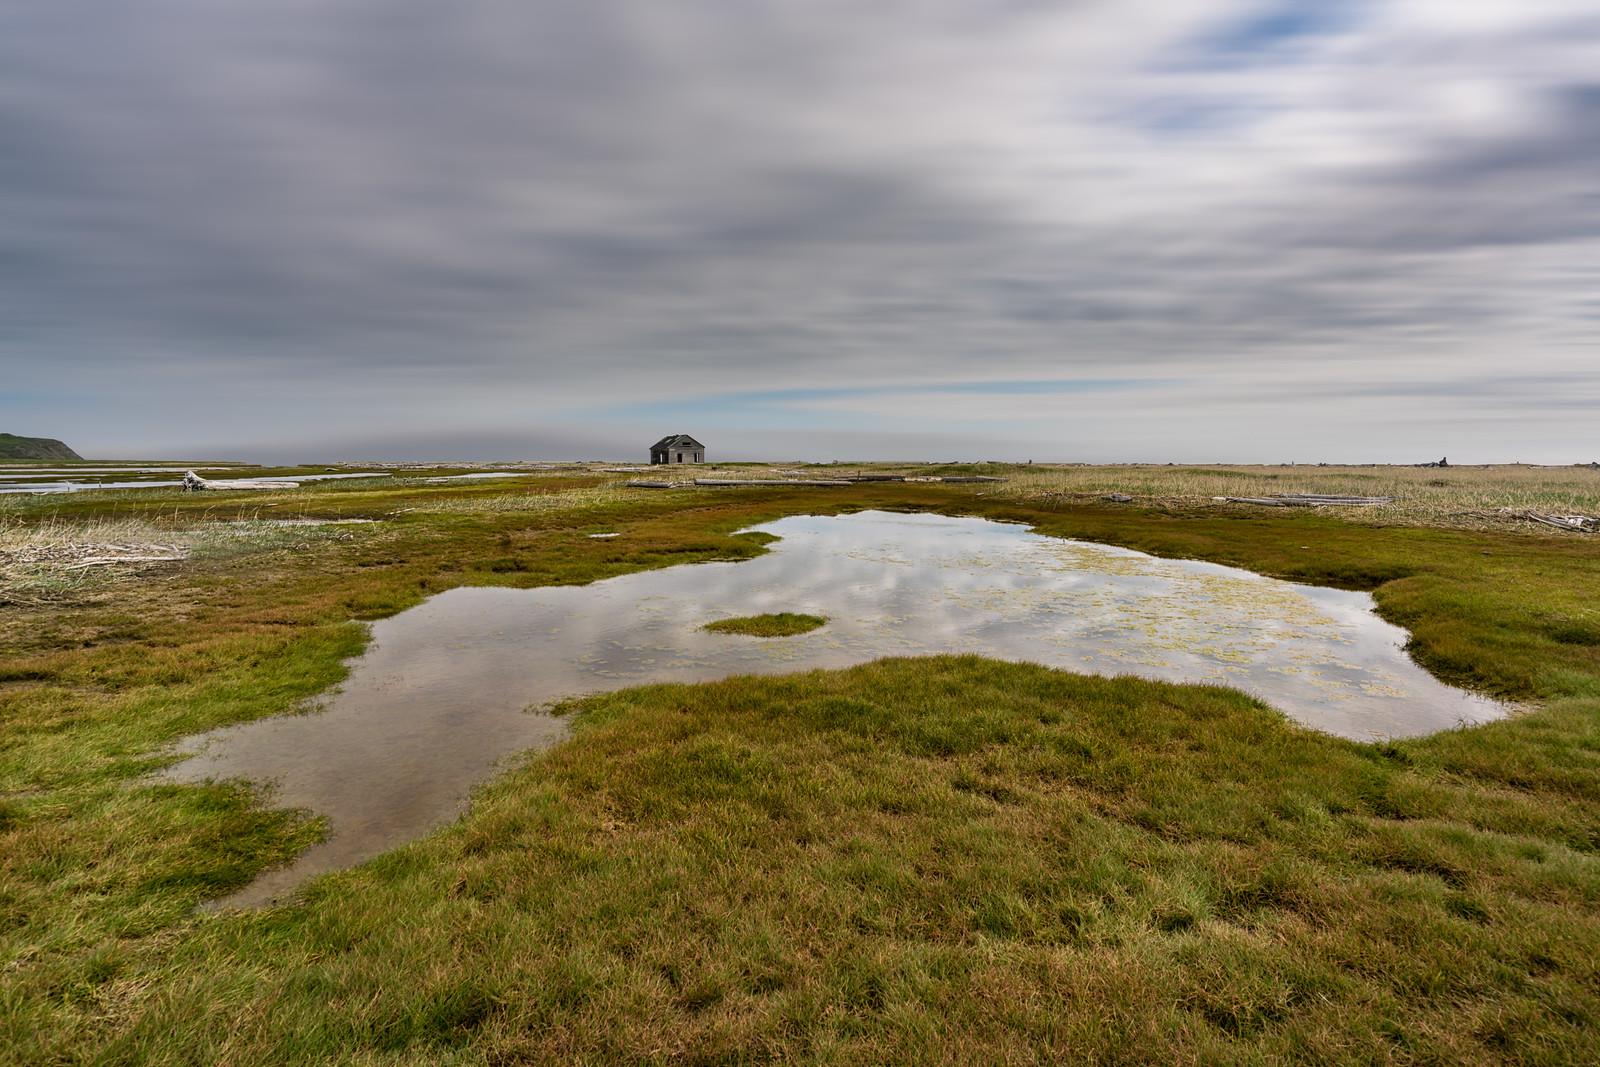 Herschel Island in Yukon, Canada